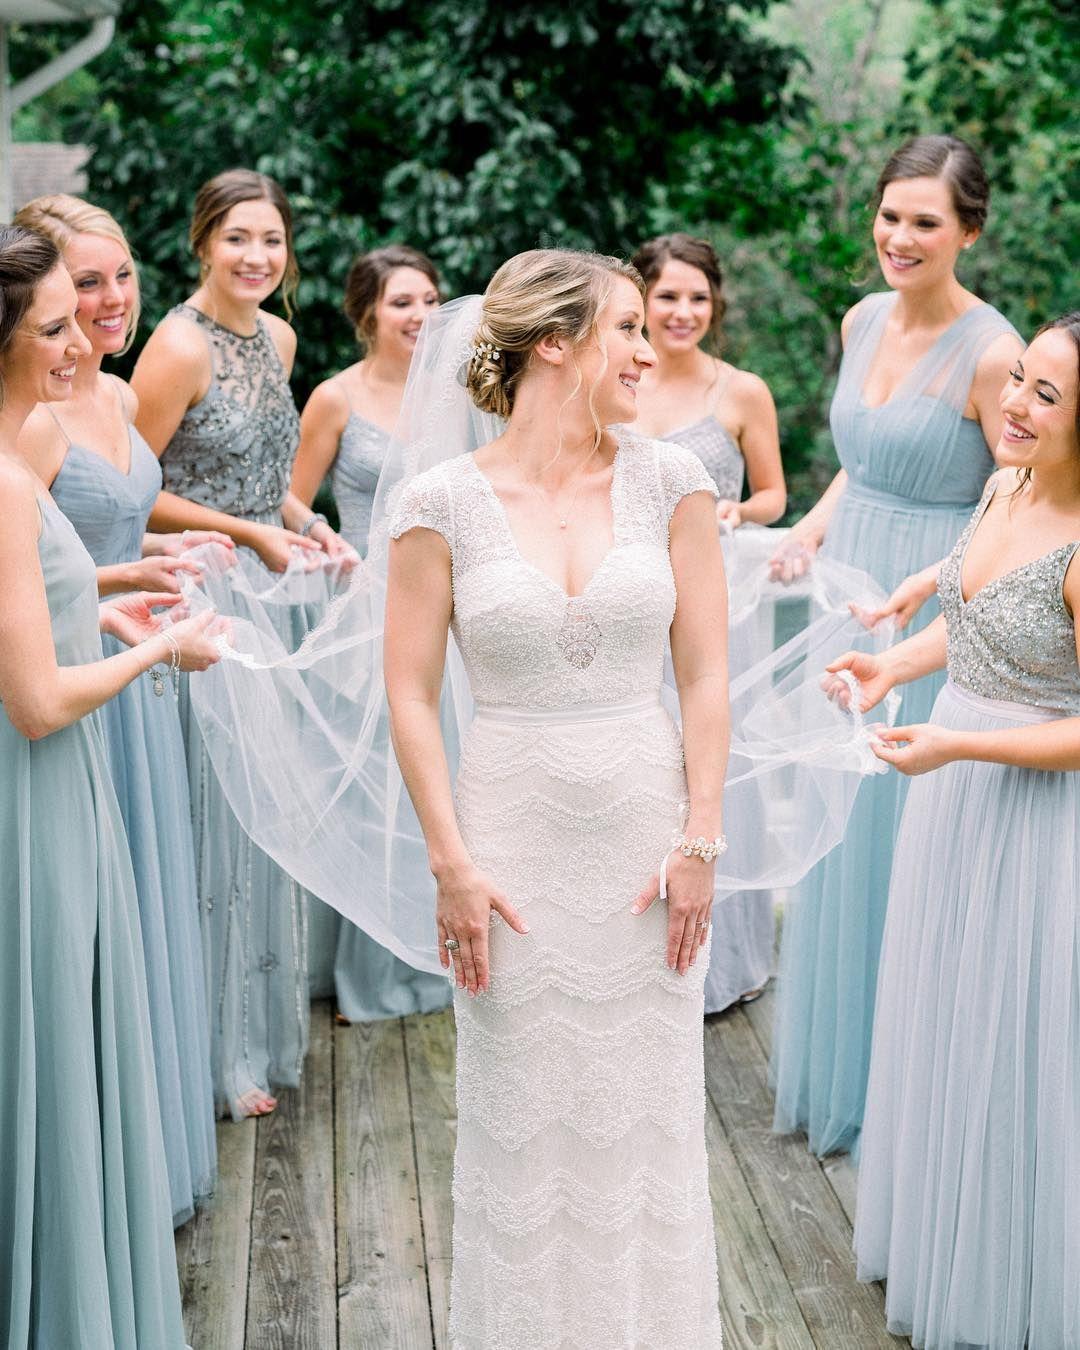 Dusty blue wedding bridesmaid dresses photo focusbayphotography